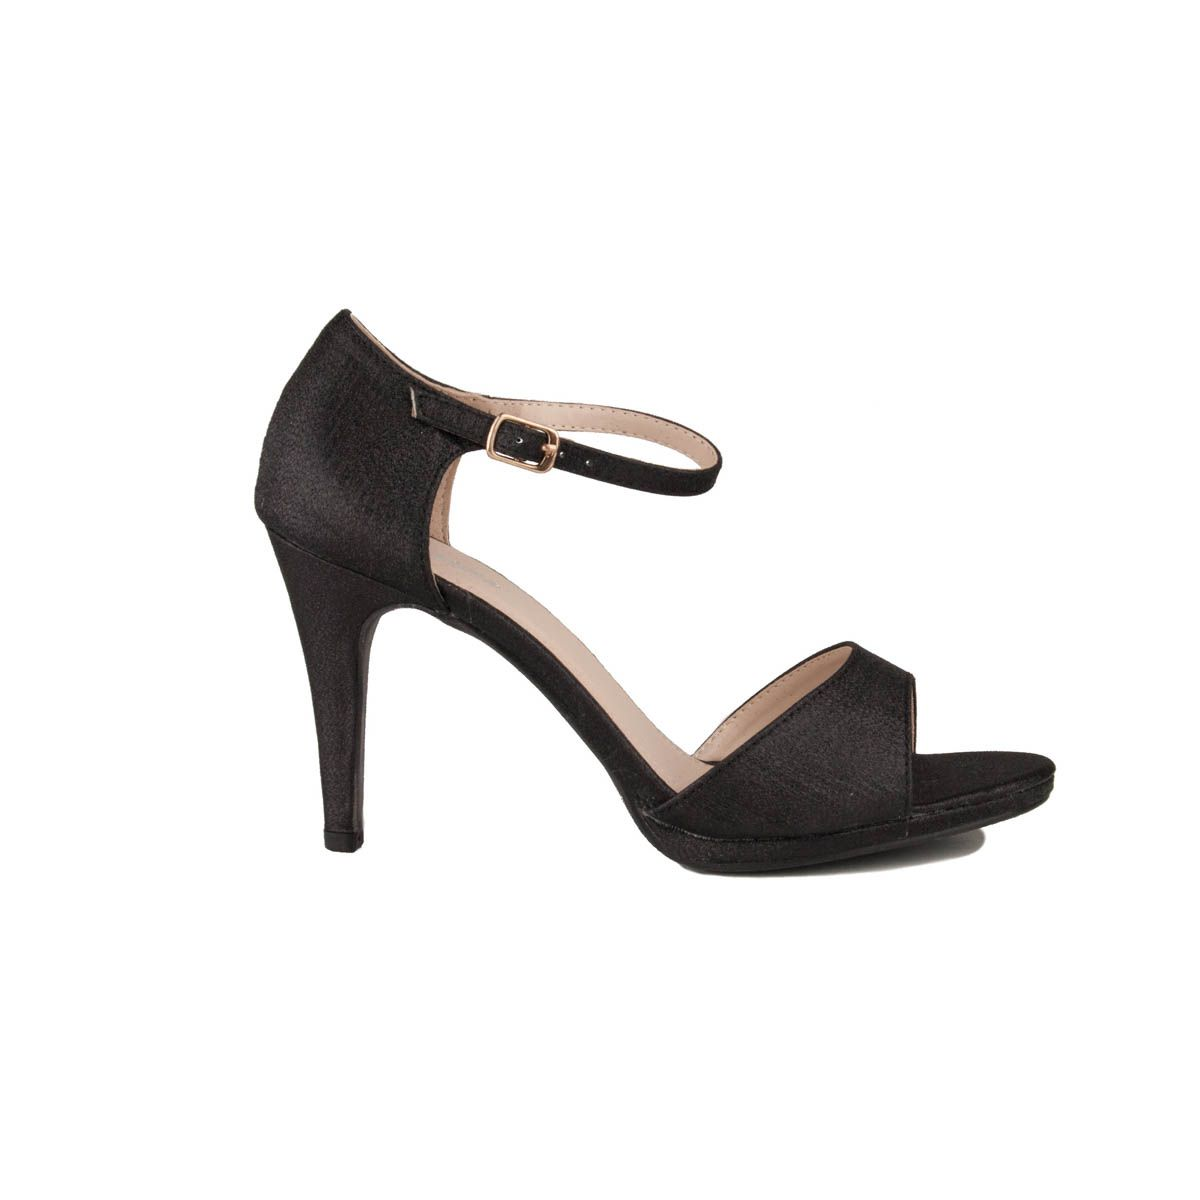 Montevita Heeled Sandal in Black